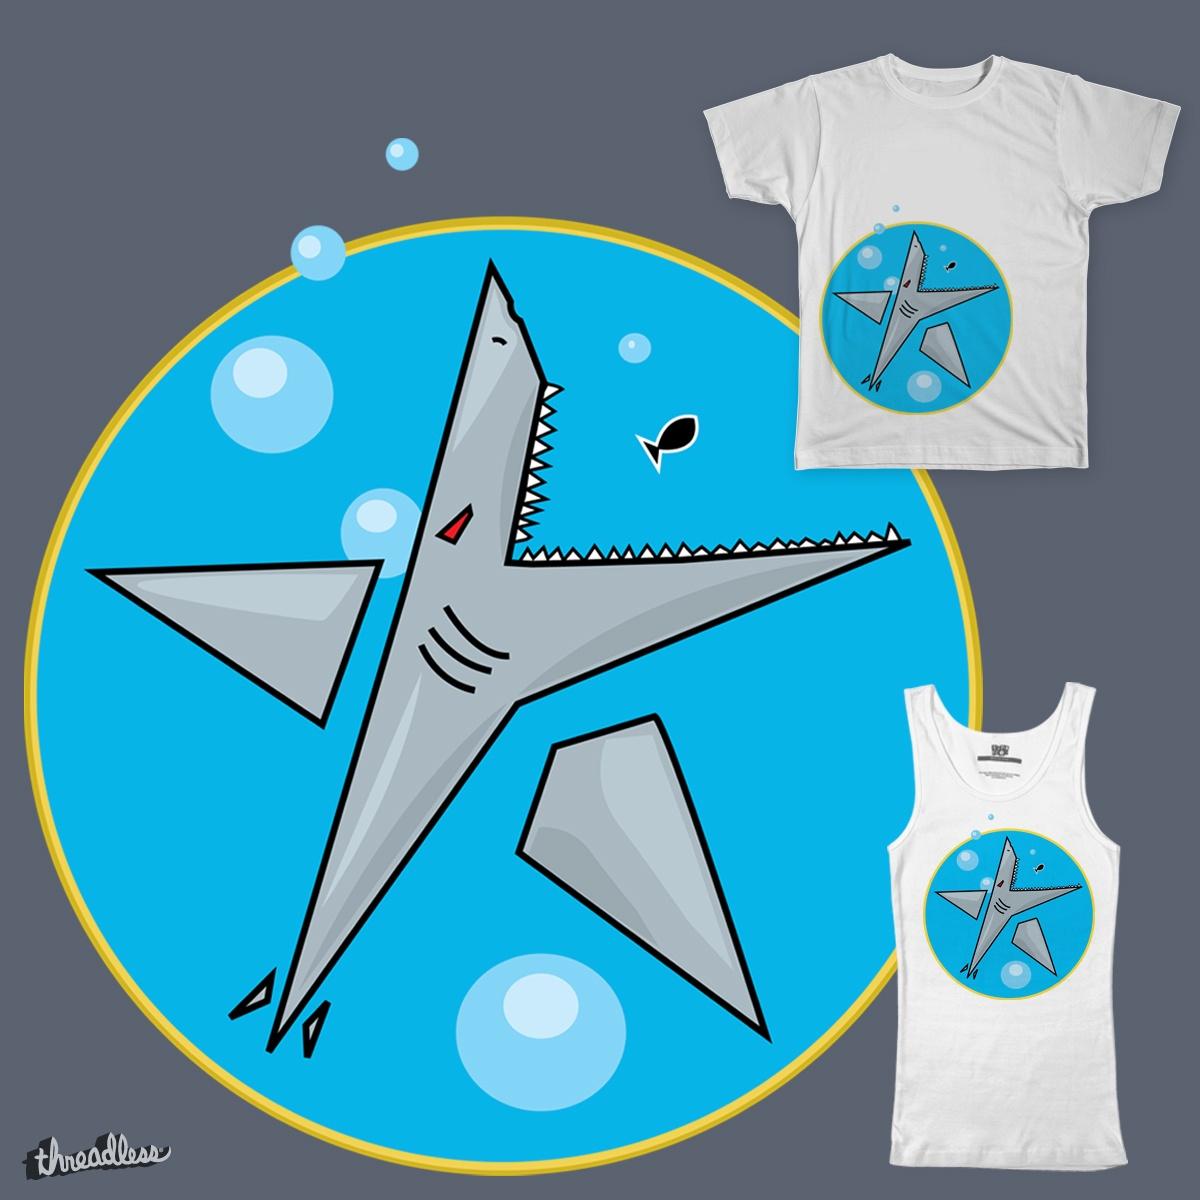 Shark Attack! by nE0n1nja on Threadless